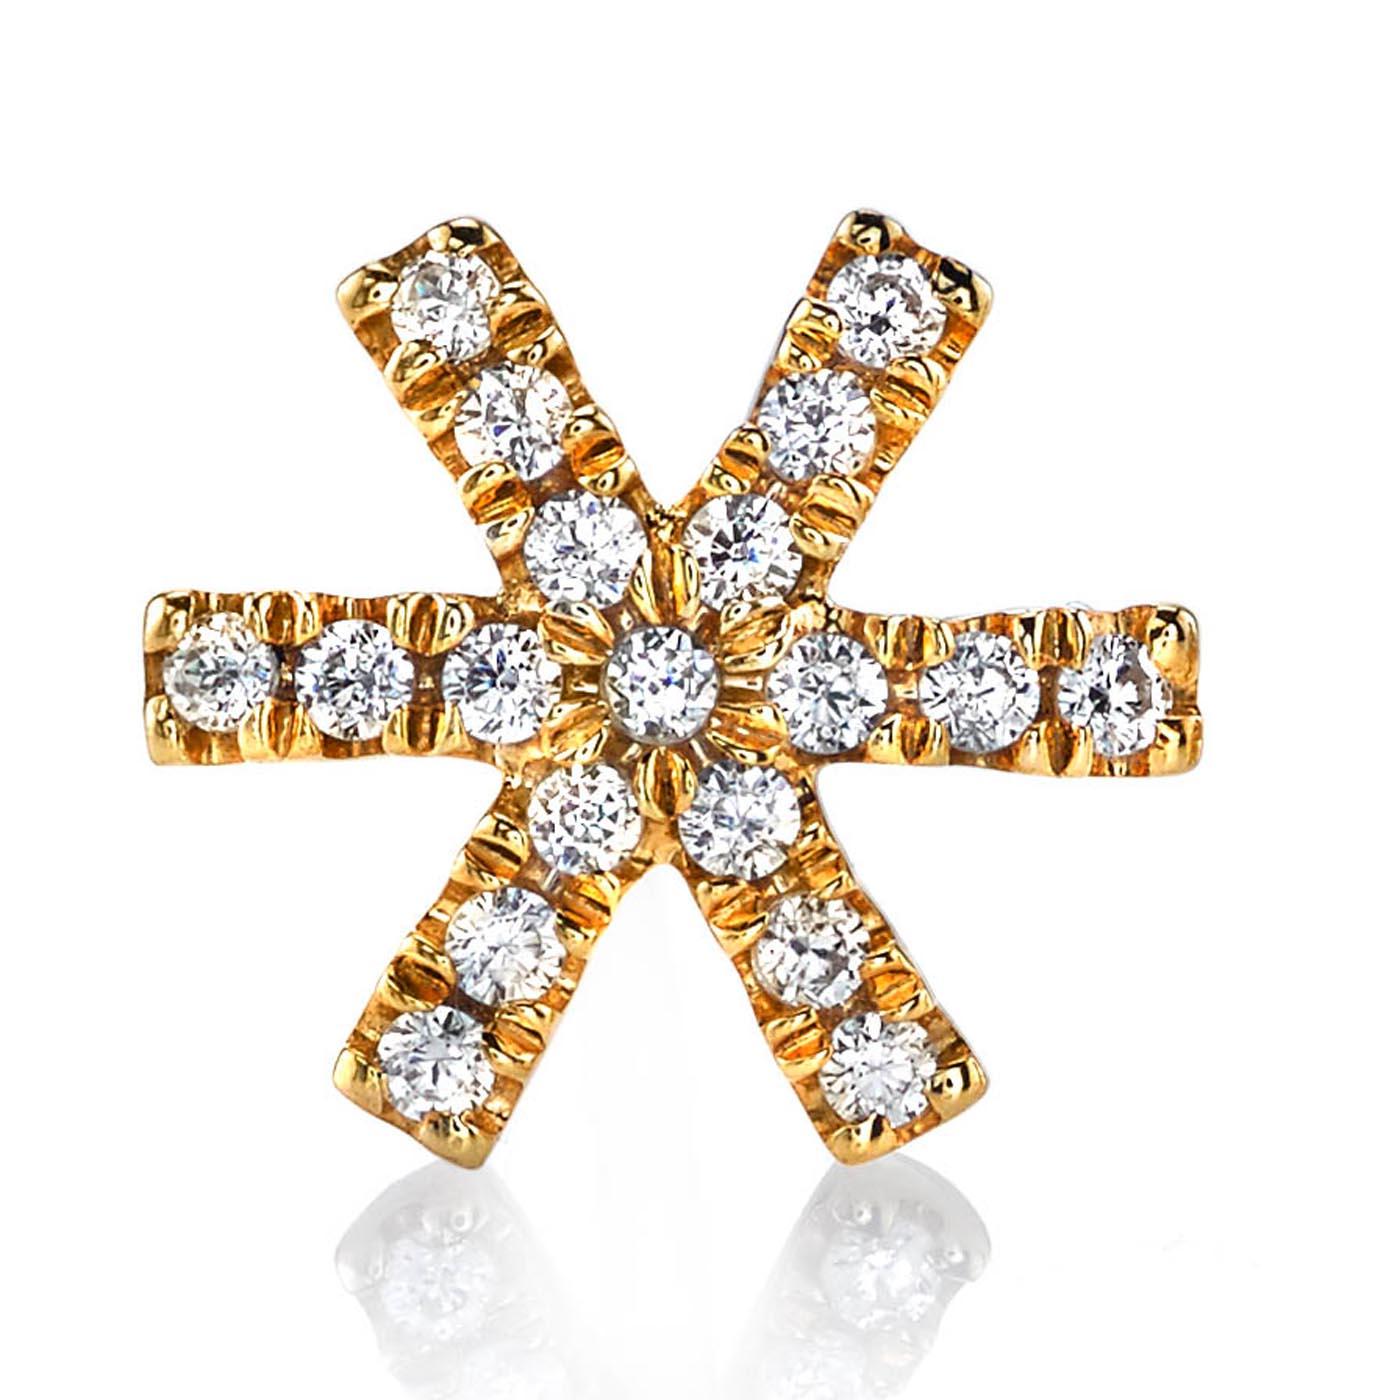 Diamond Earrings - Studs Style #: MARS-26678